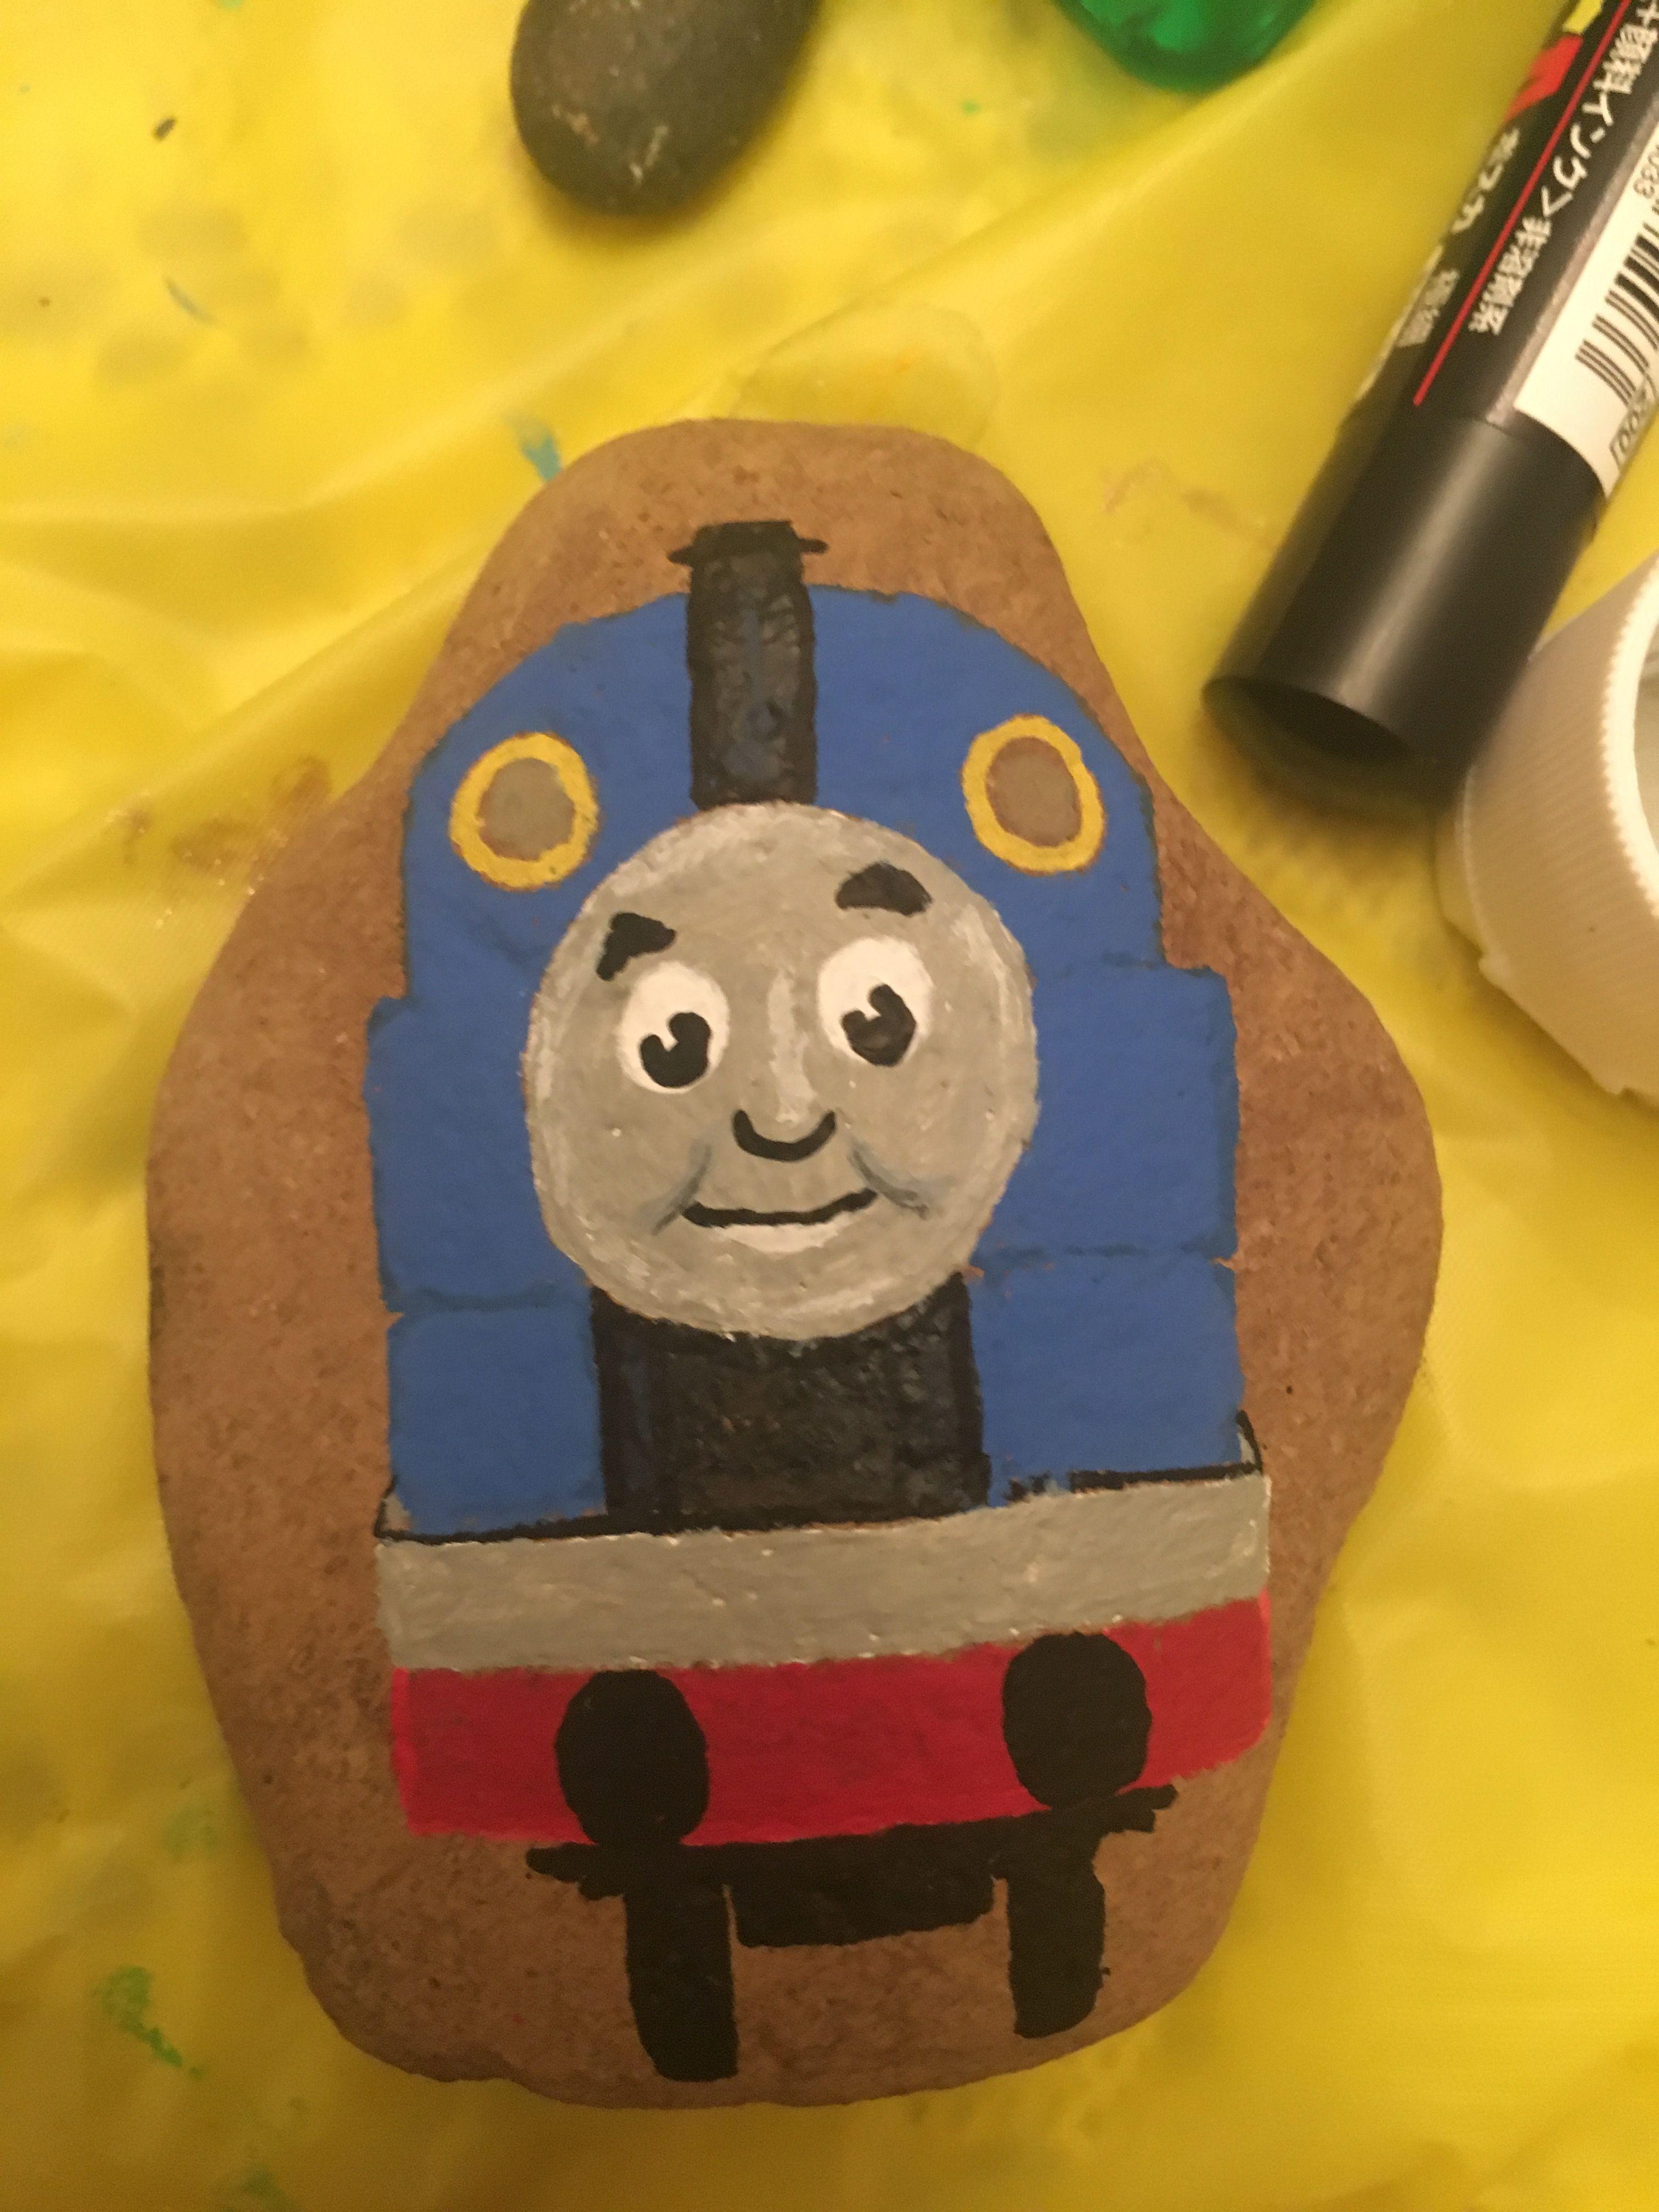 Thomas The Tank Engine Painted Rock Painted Rocks Kids Pebble Painting Rock Crafts